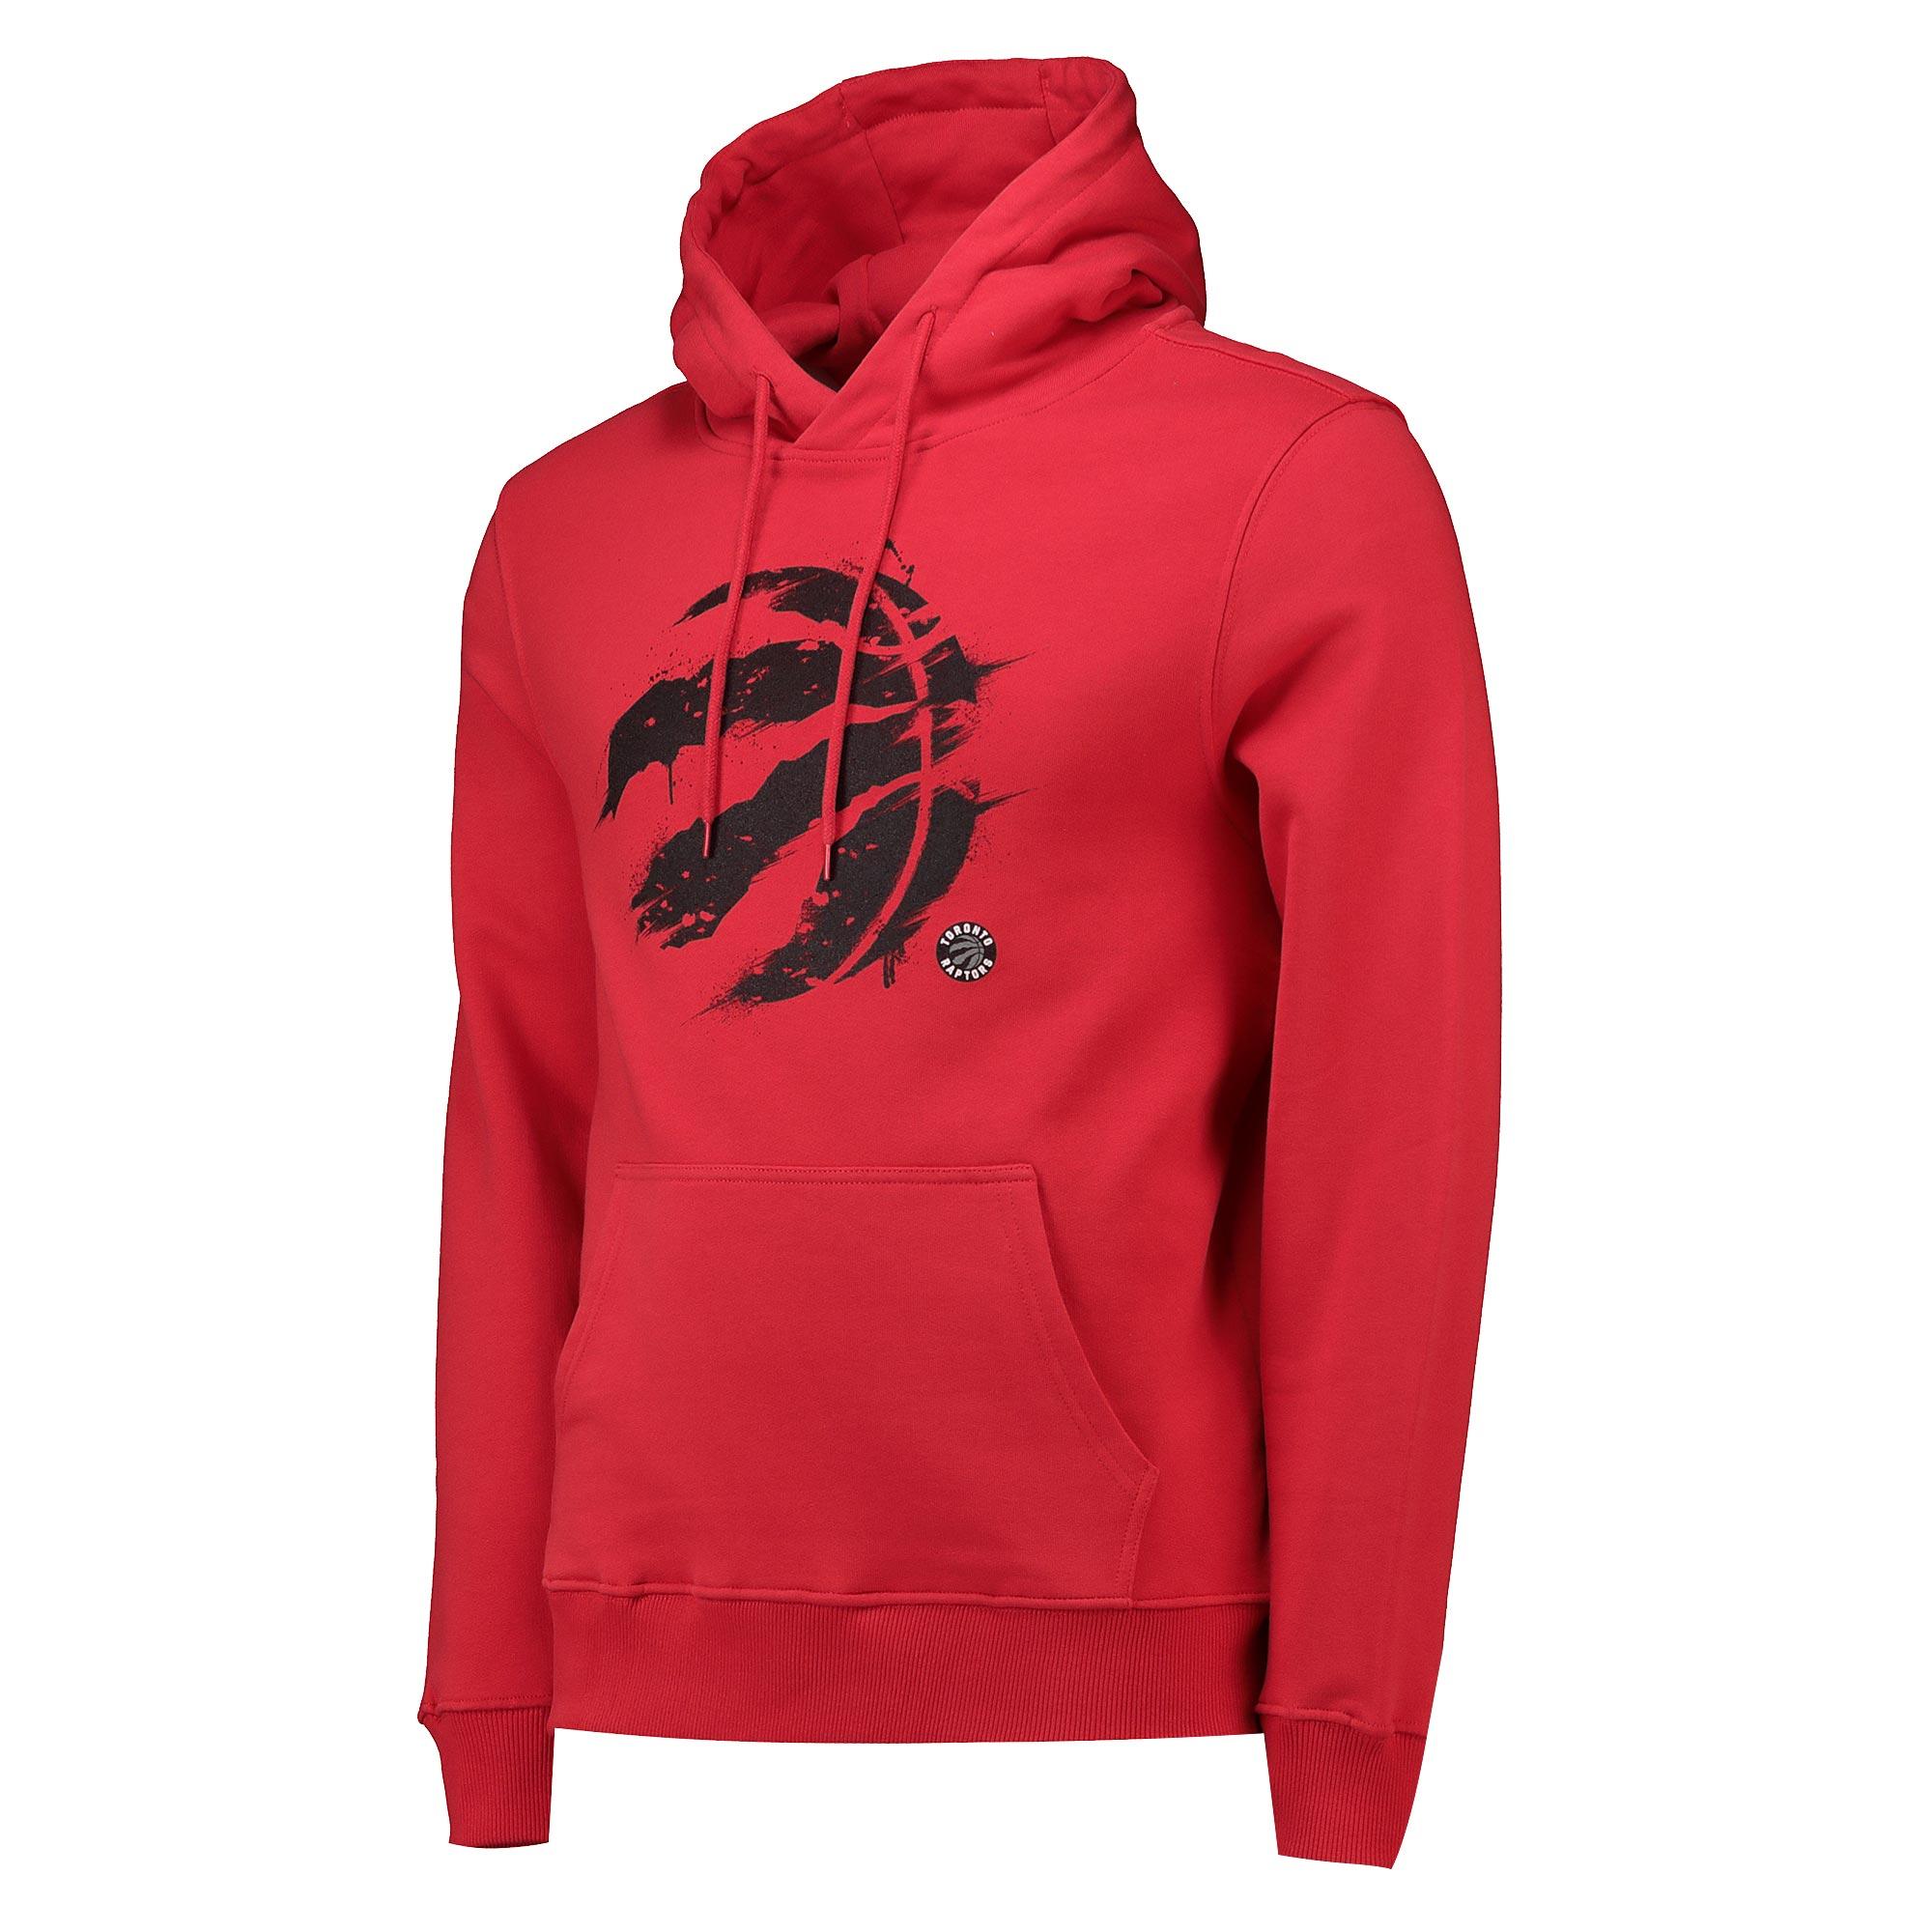 Toronto Raptors Graphic Splatter Hoodie - Uni Red - Mens